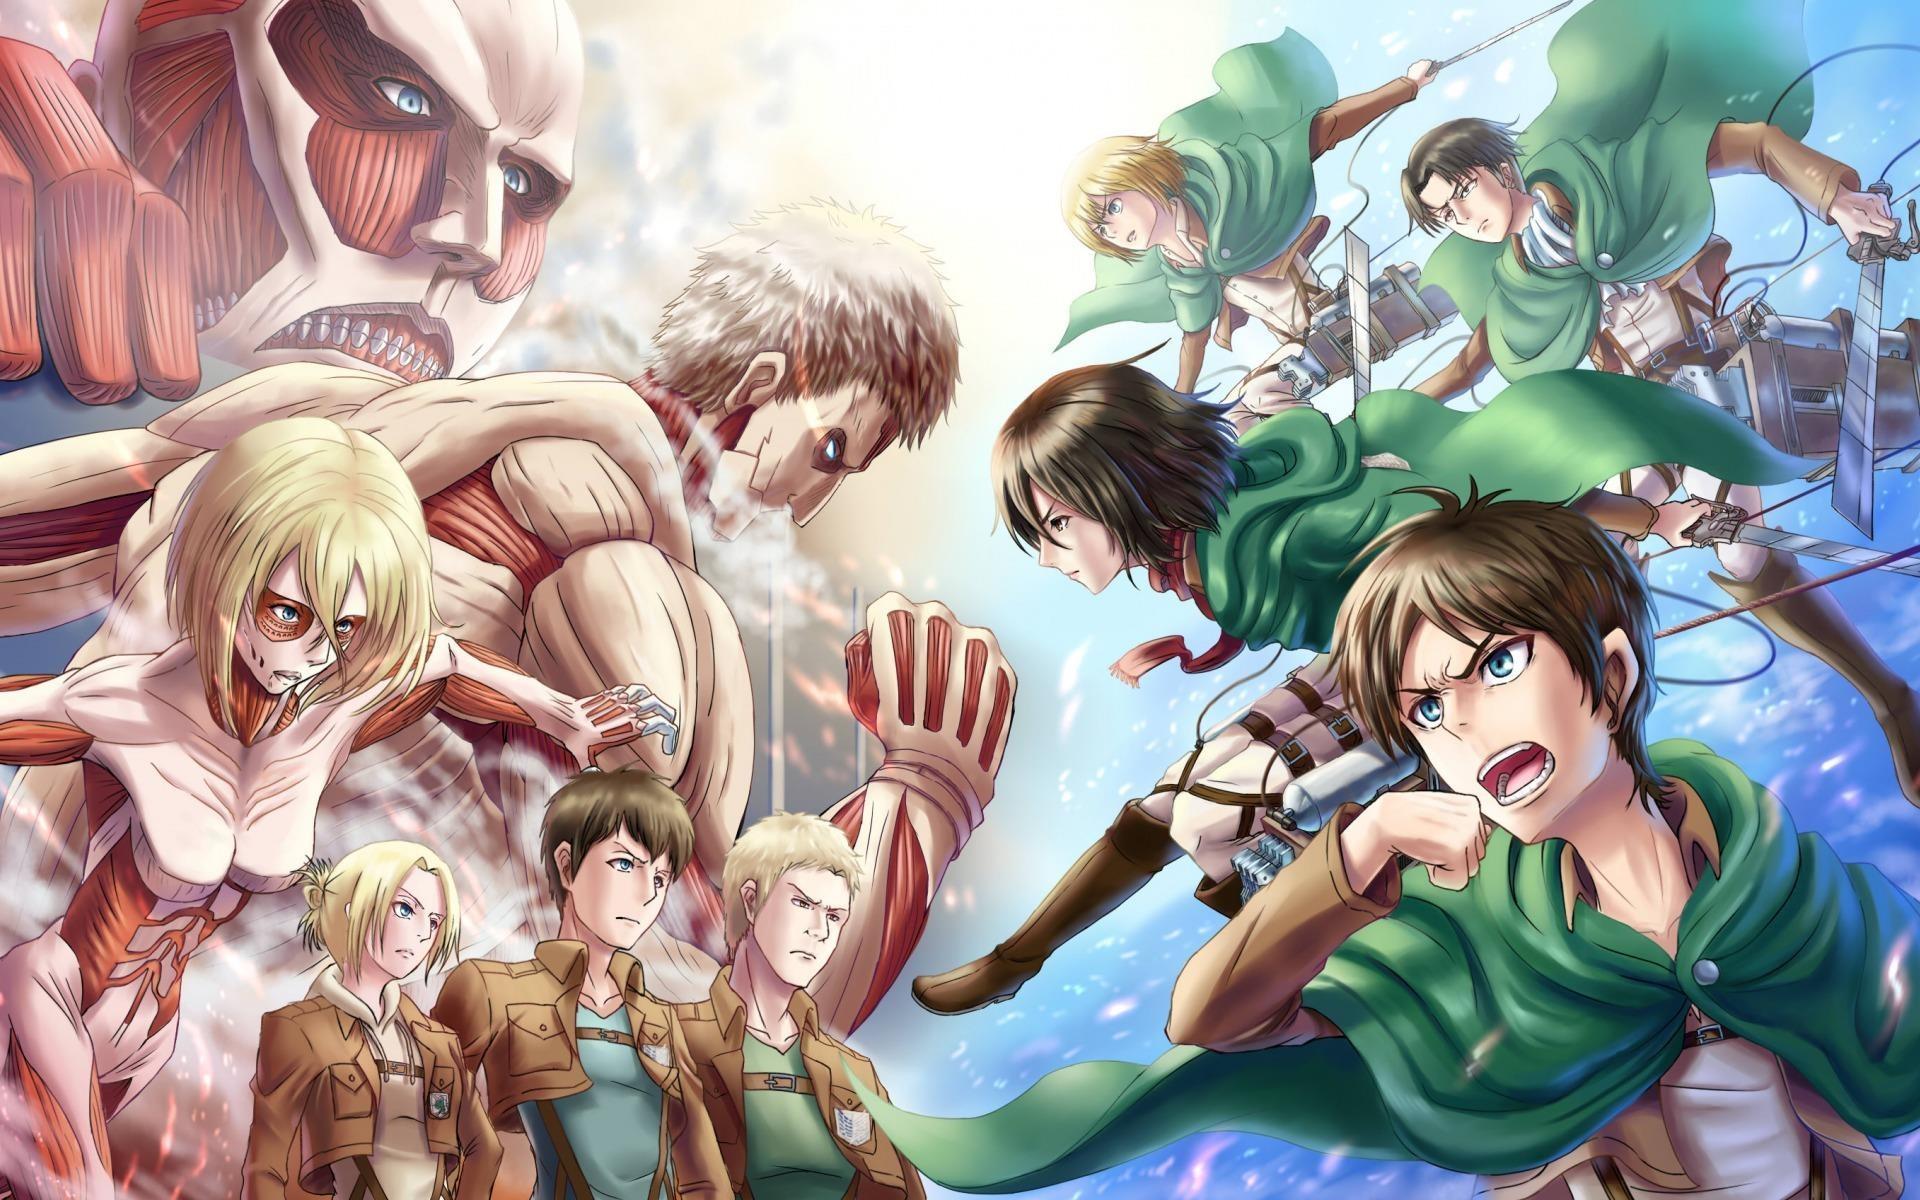 X High Quality Manga Wallpaper  Wallpapers